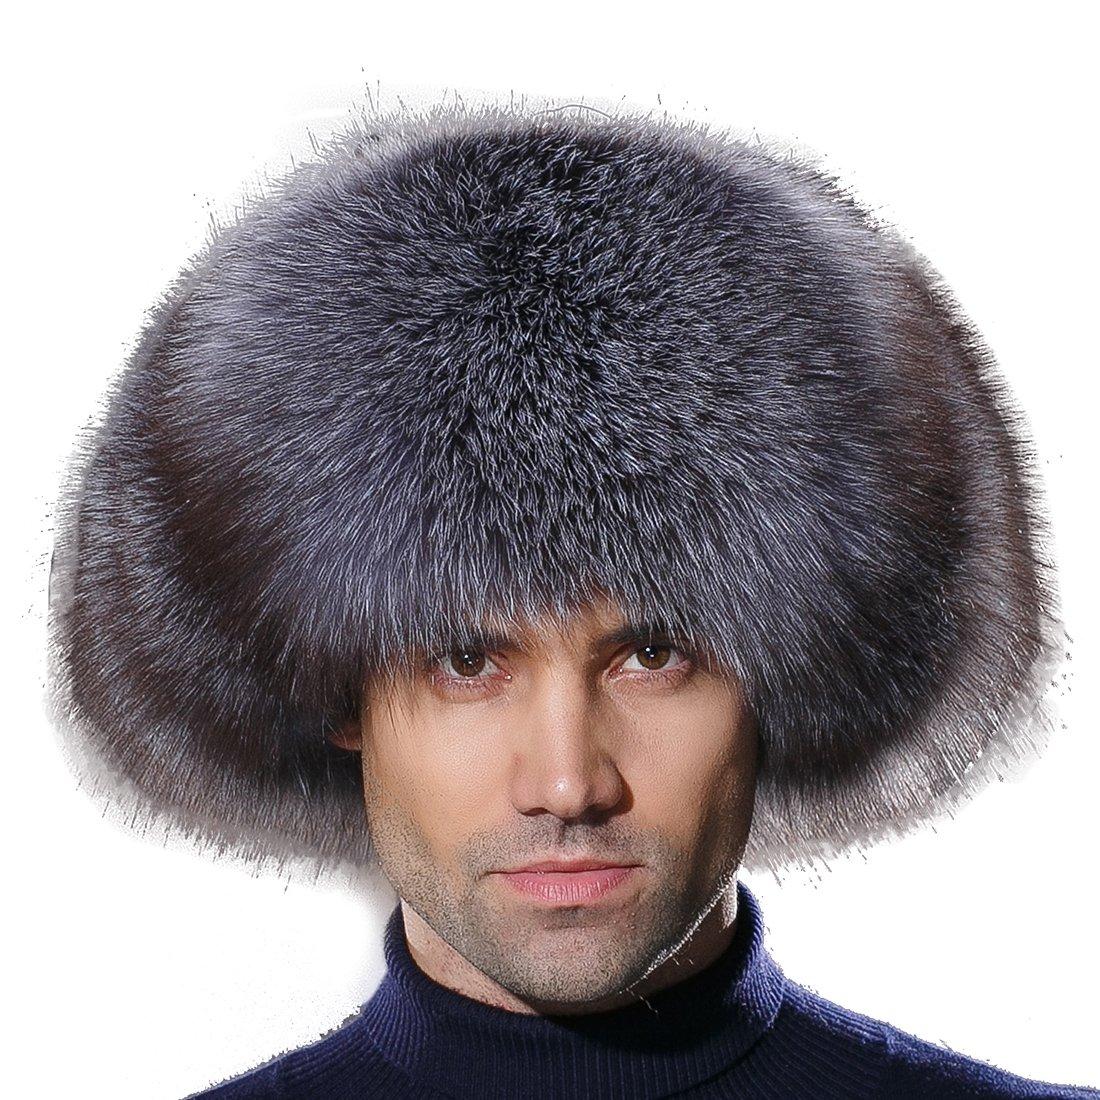 URSFUR Mens Russian Ushanka Hat Real Leather & Silver Blue Fox Fur Trapper Cap by URSFUR